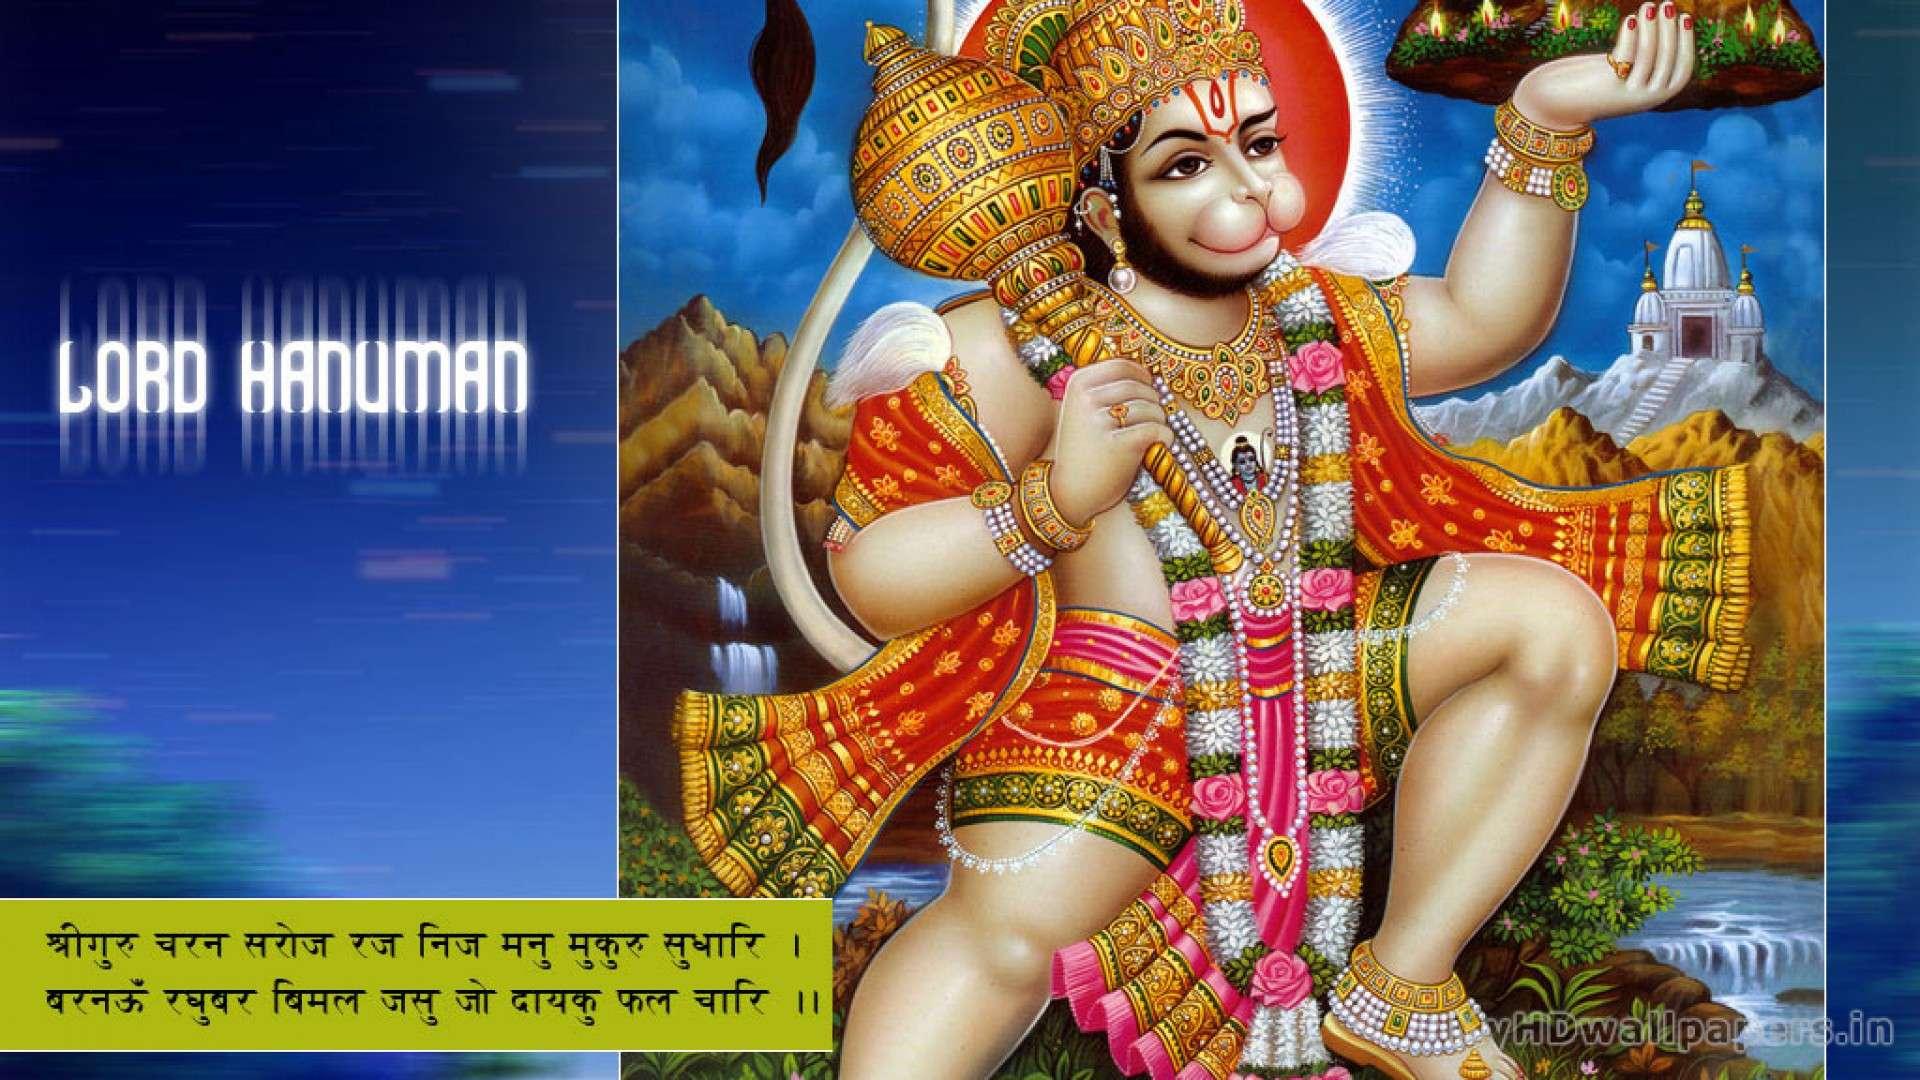 Free download Hanuman Wallpaper Full Size Desktop Hd ...